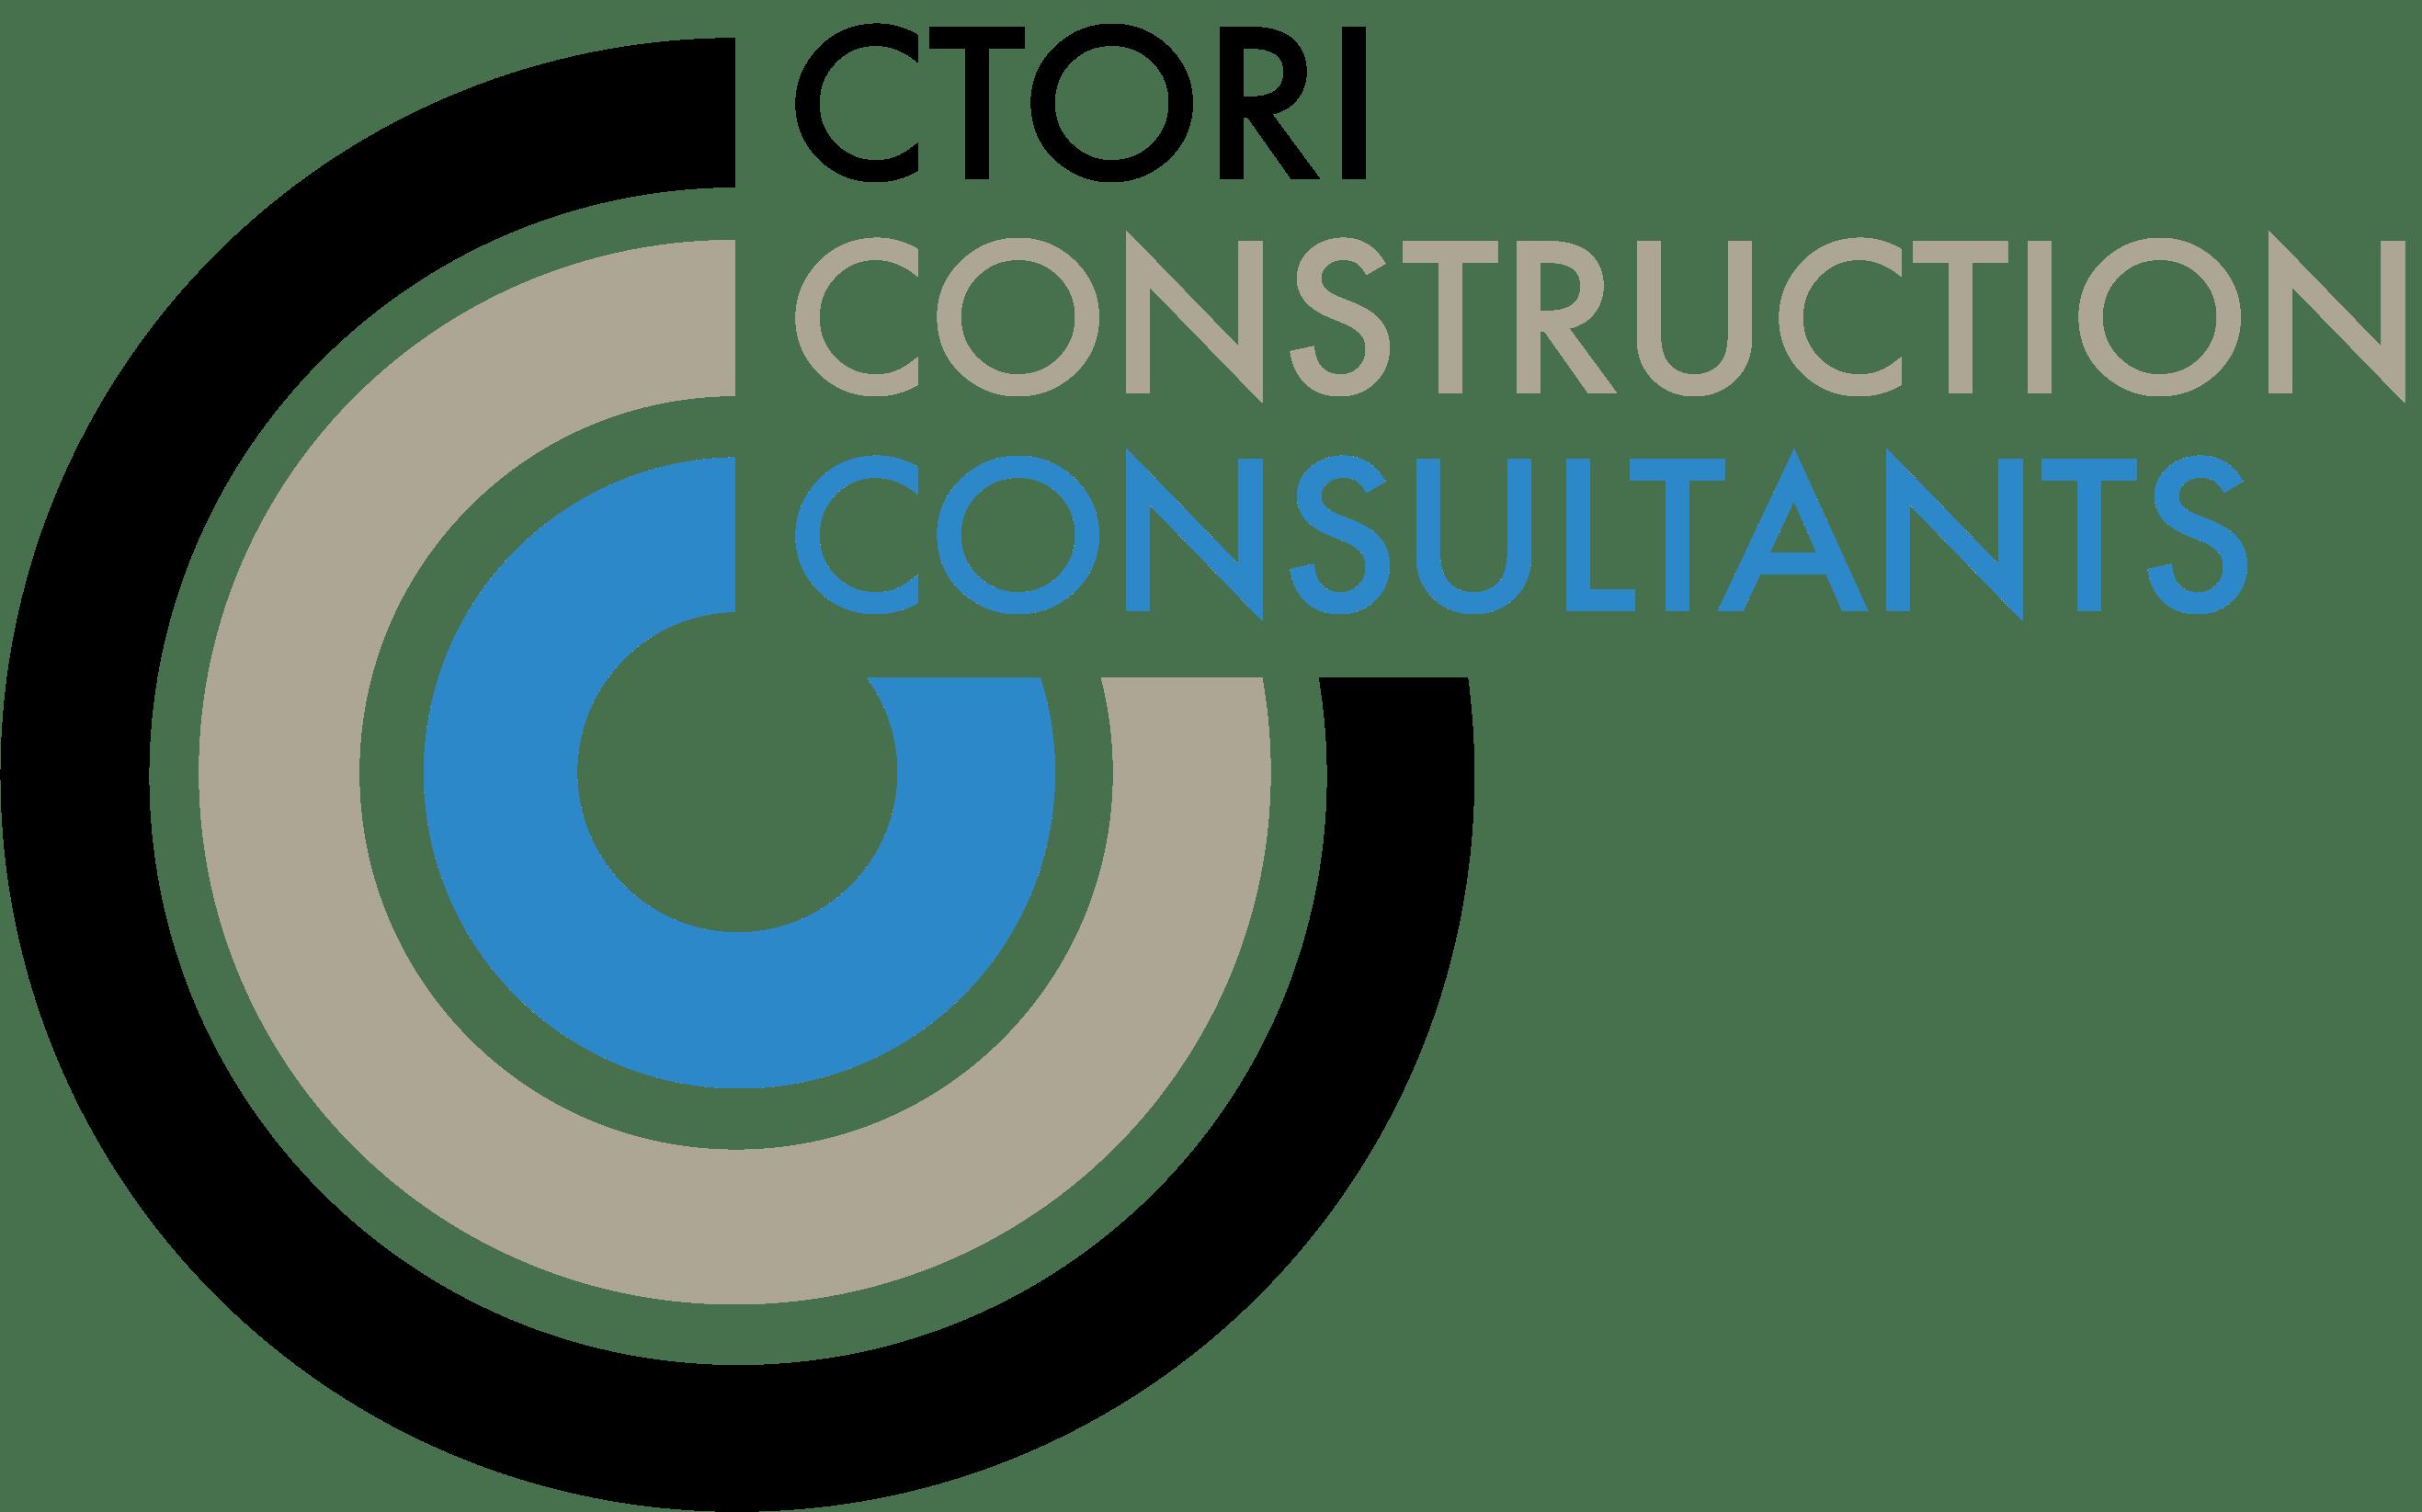 Ctori Construction Consultants